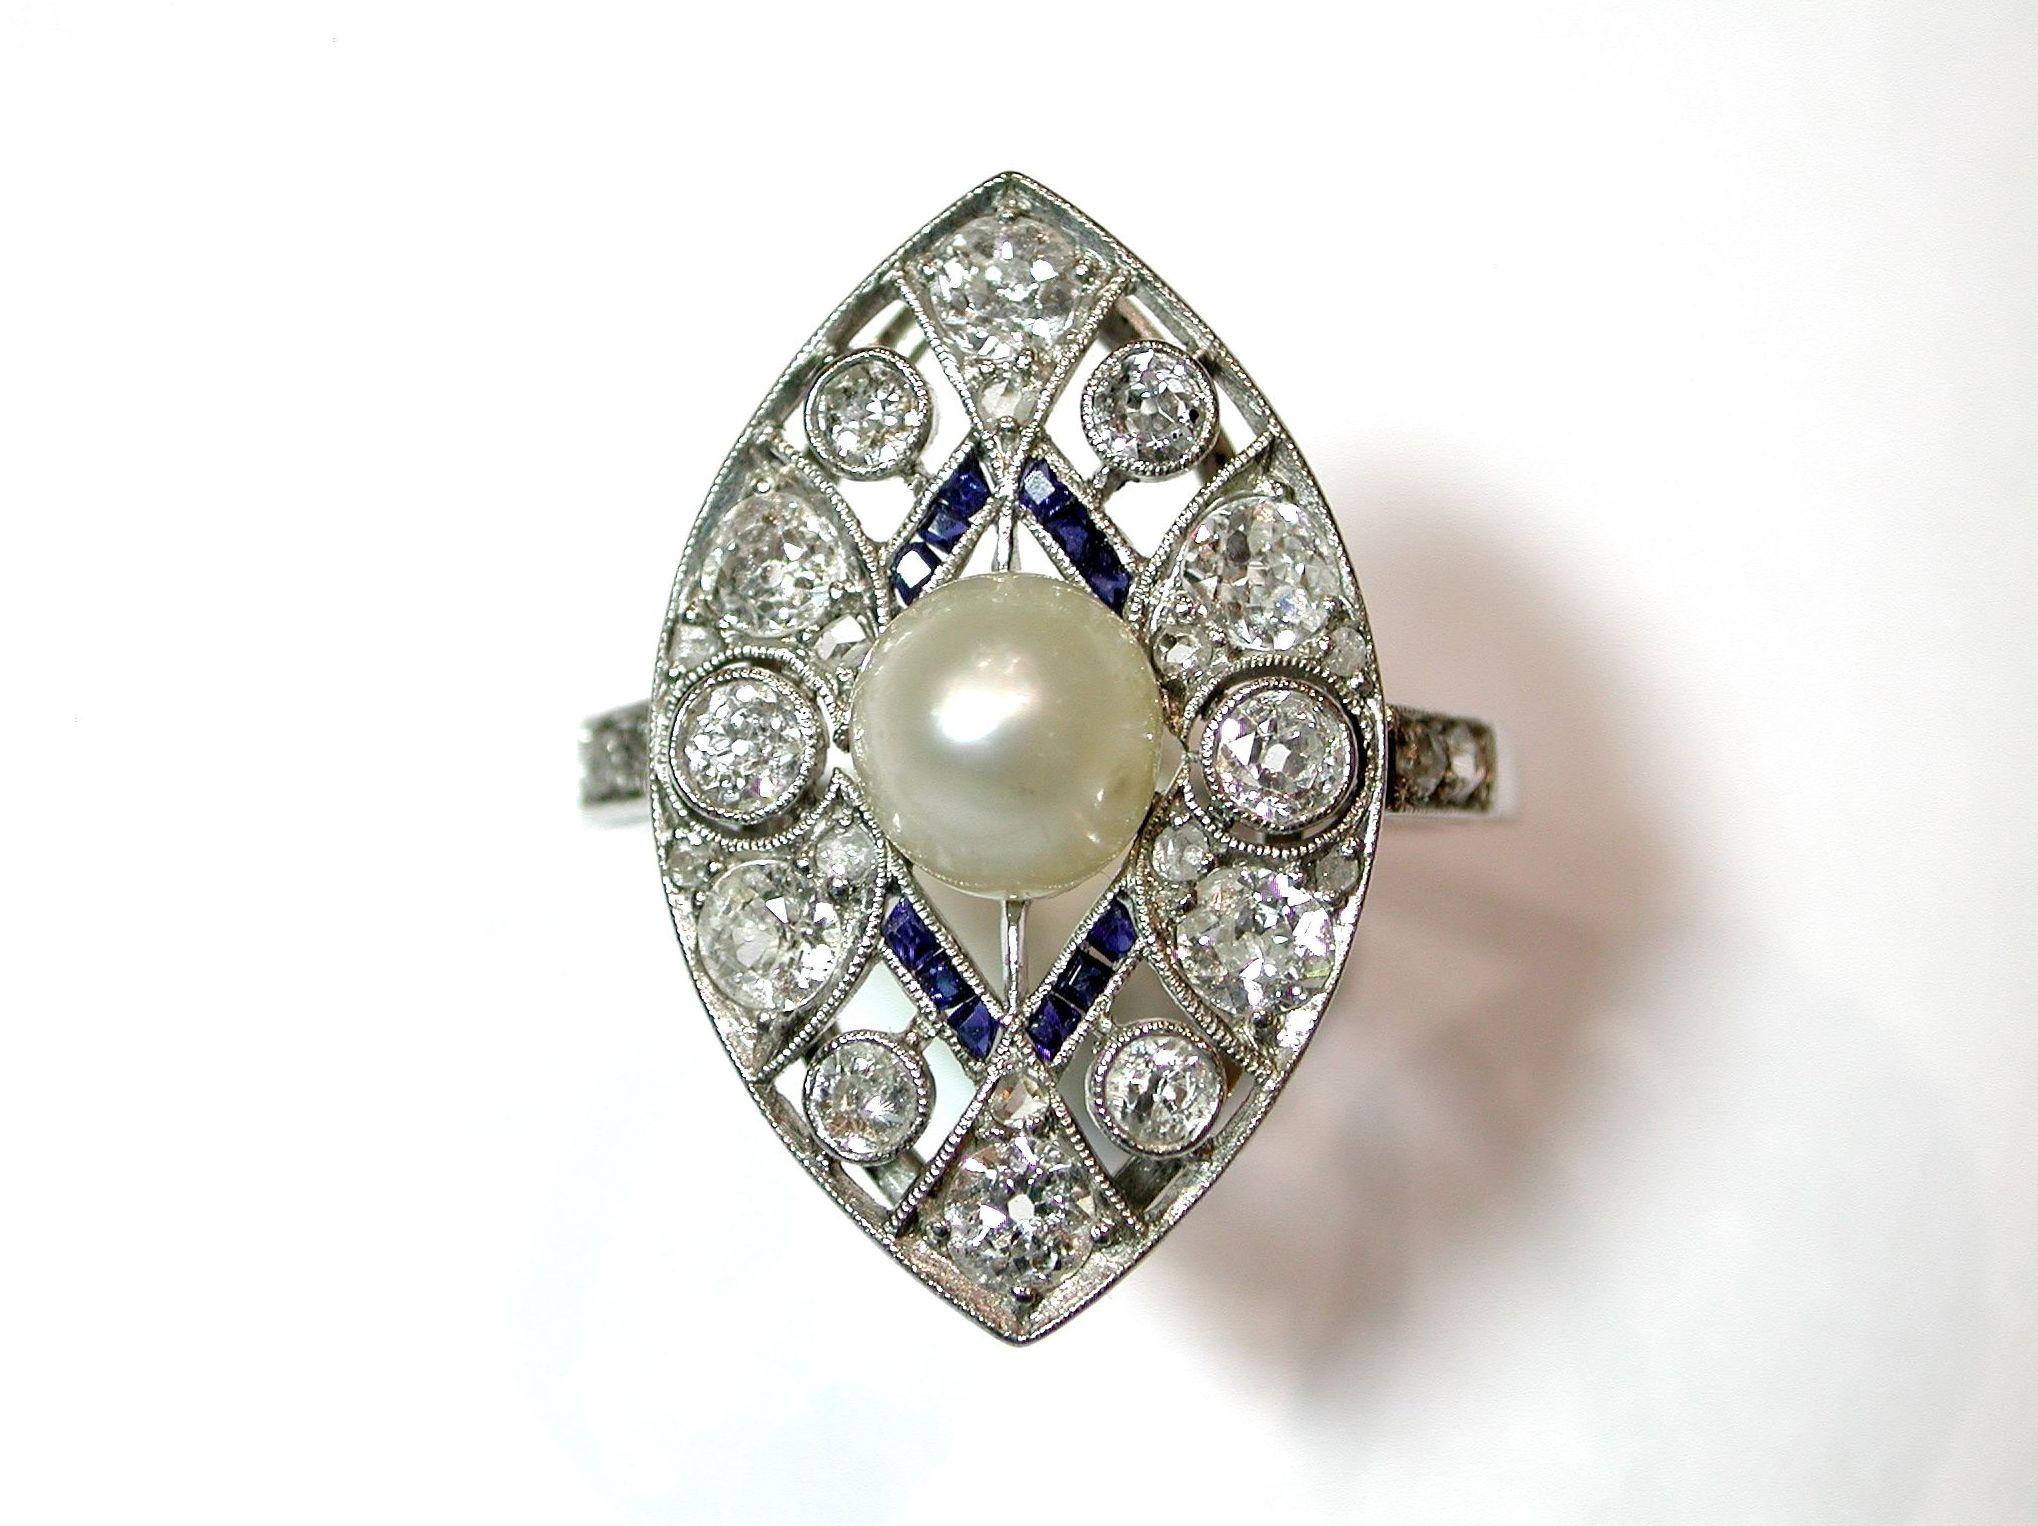 Sortija Art Decó realizada en platino con brillantes talla antigua, zafiros calibrados y perla cultivada. Circa: 1920-1930.